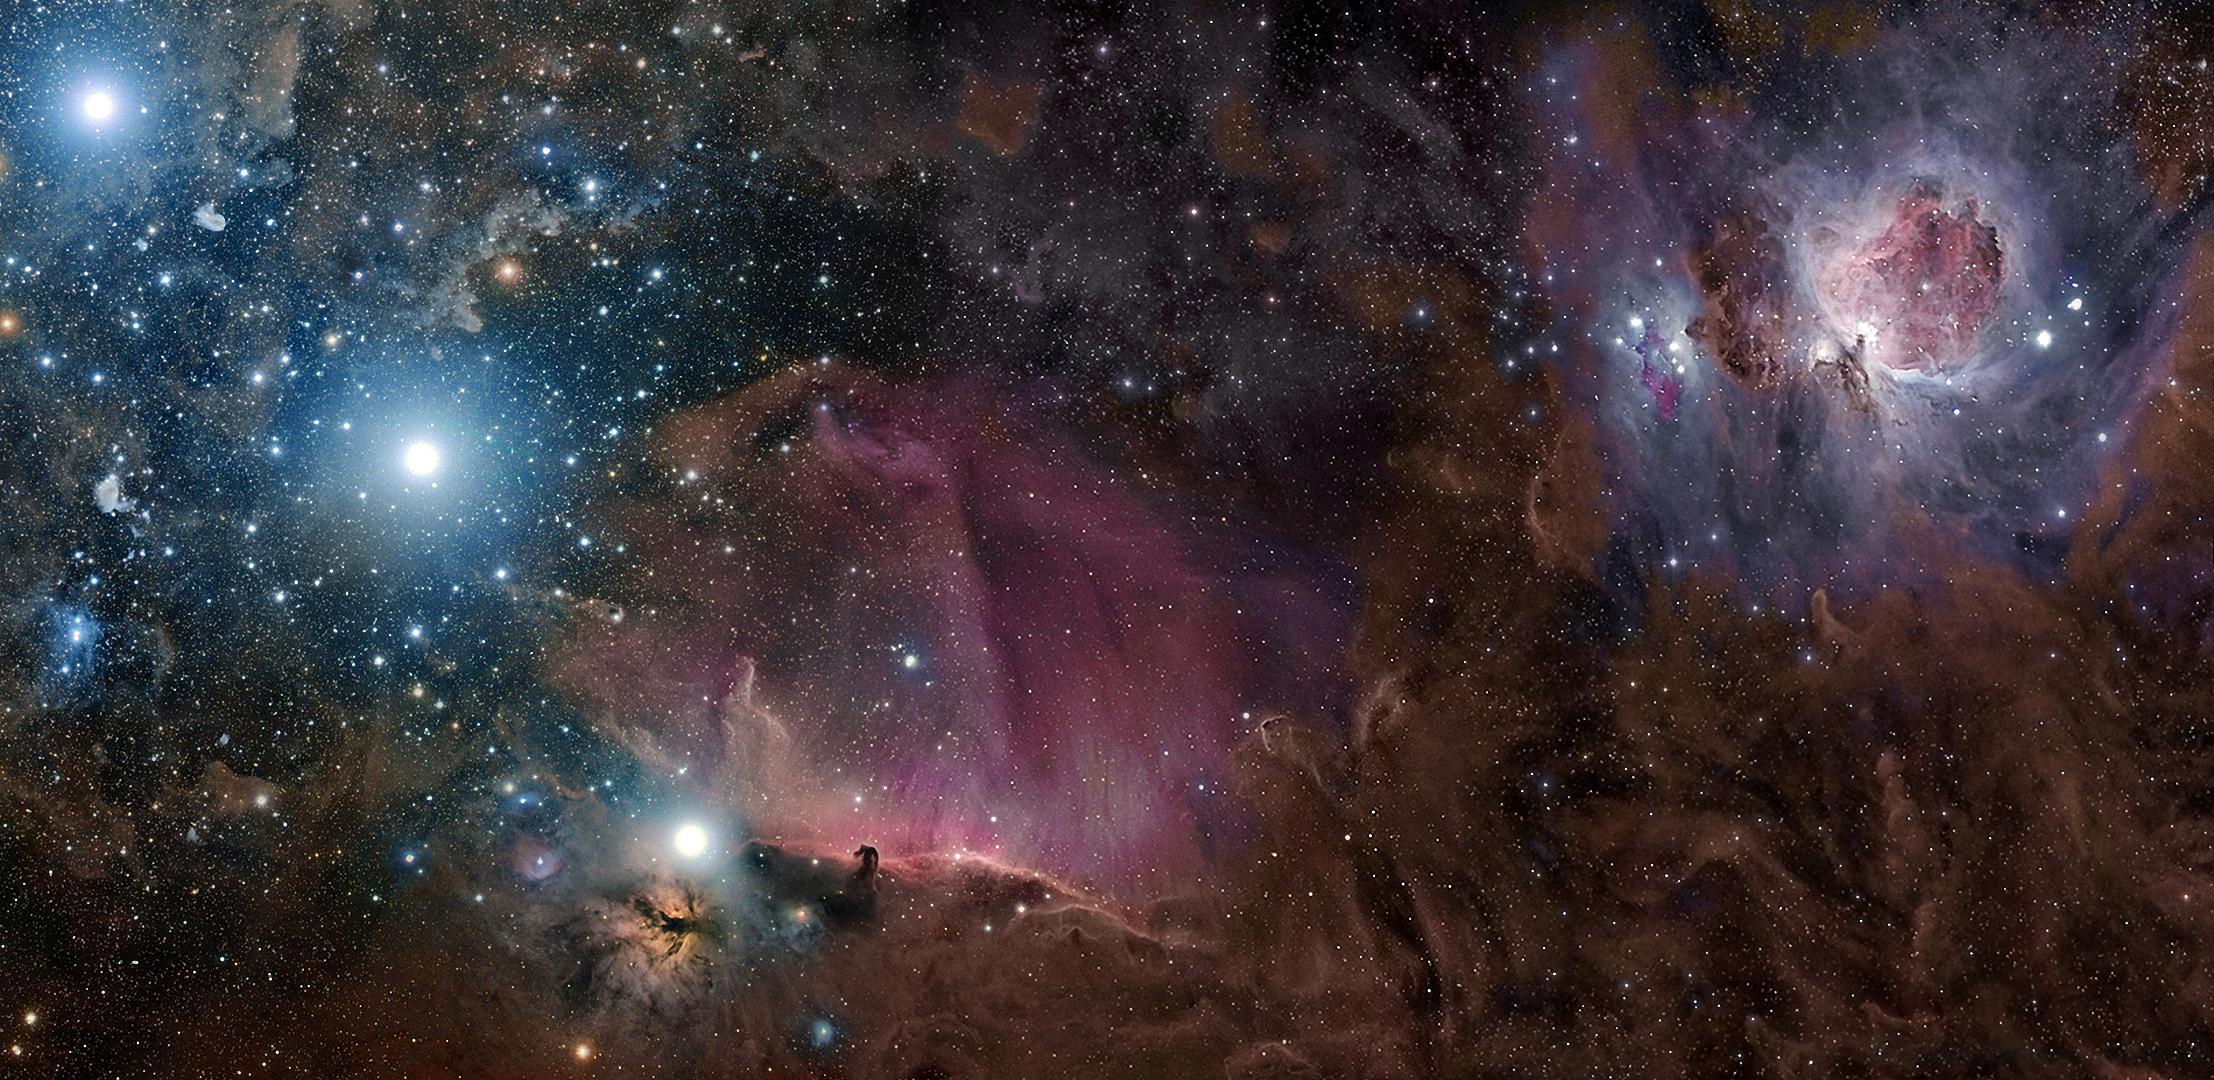 orion nebula nasa starseed 4k constellation hubble belt space telescope wallpapersafari wallpapers astronomy sharpest universe desktop code definition becuo wallpaperaccess